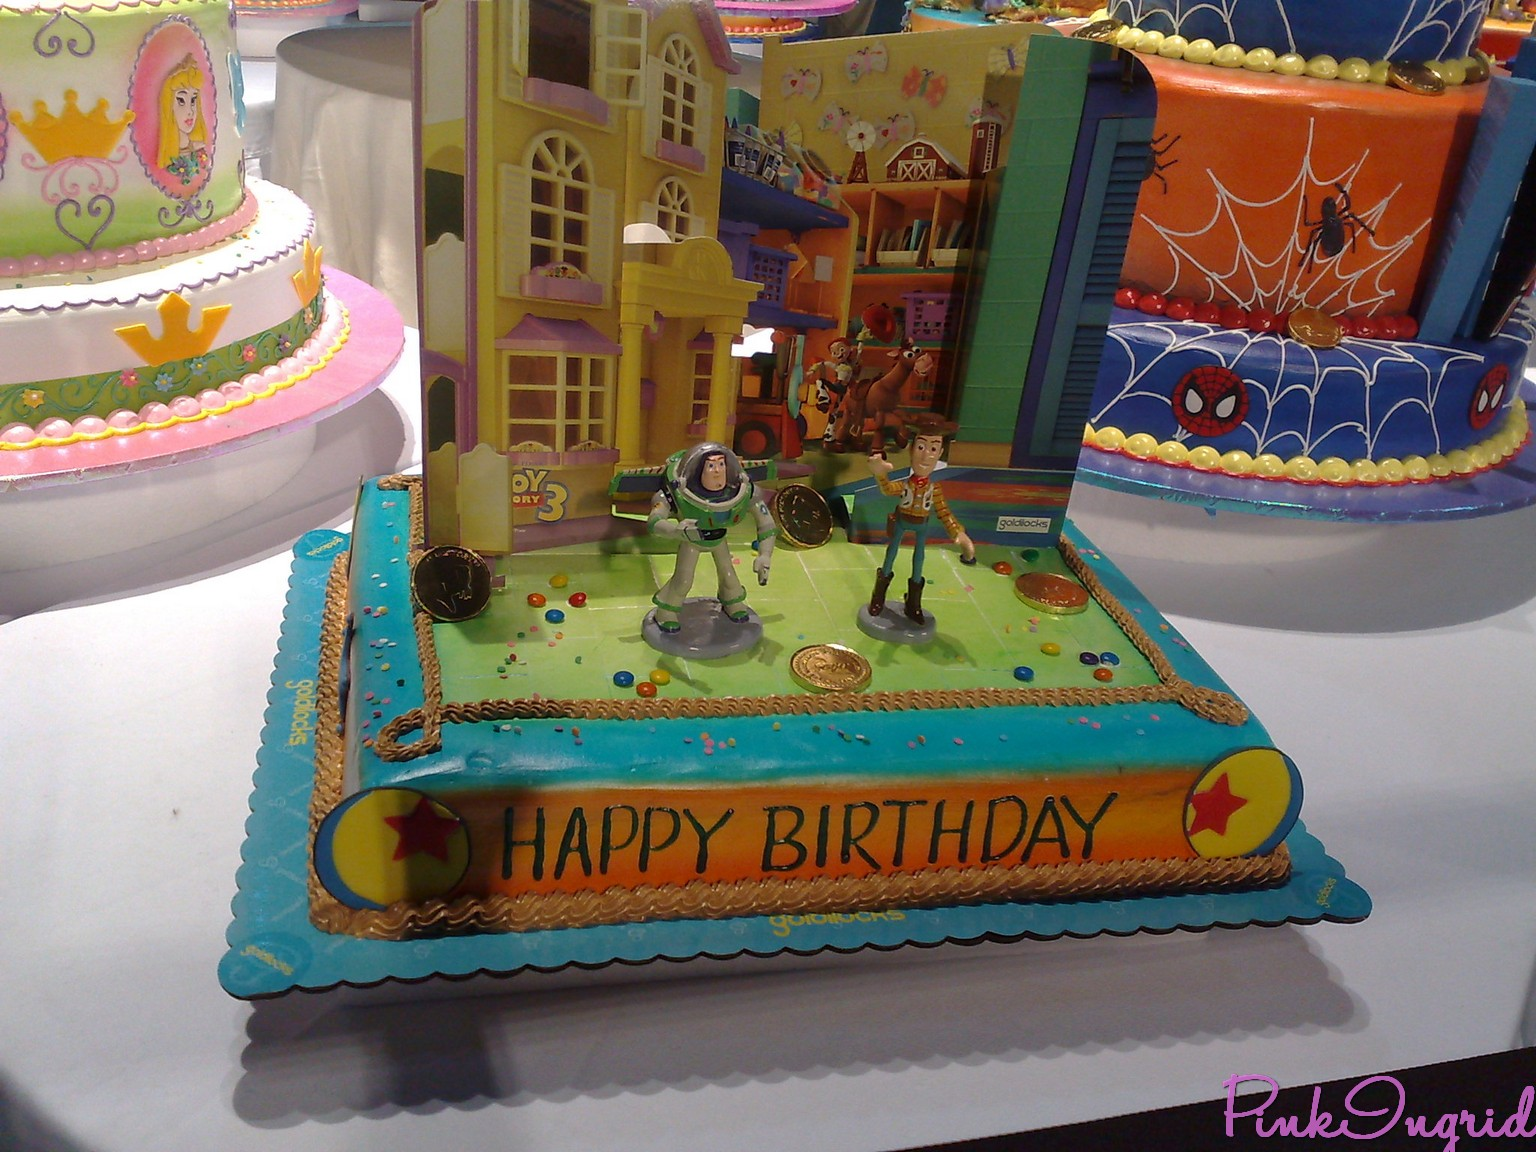 Goldilocks Cake Design For Debut : 1536px